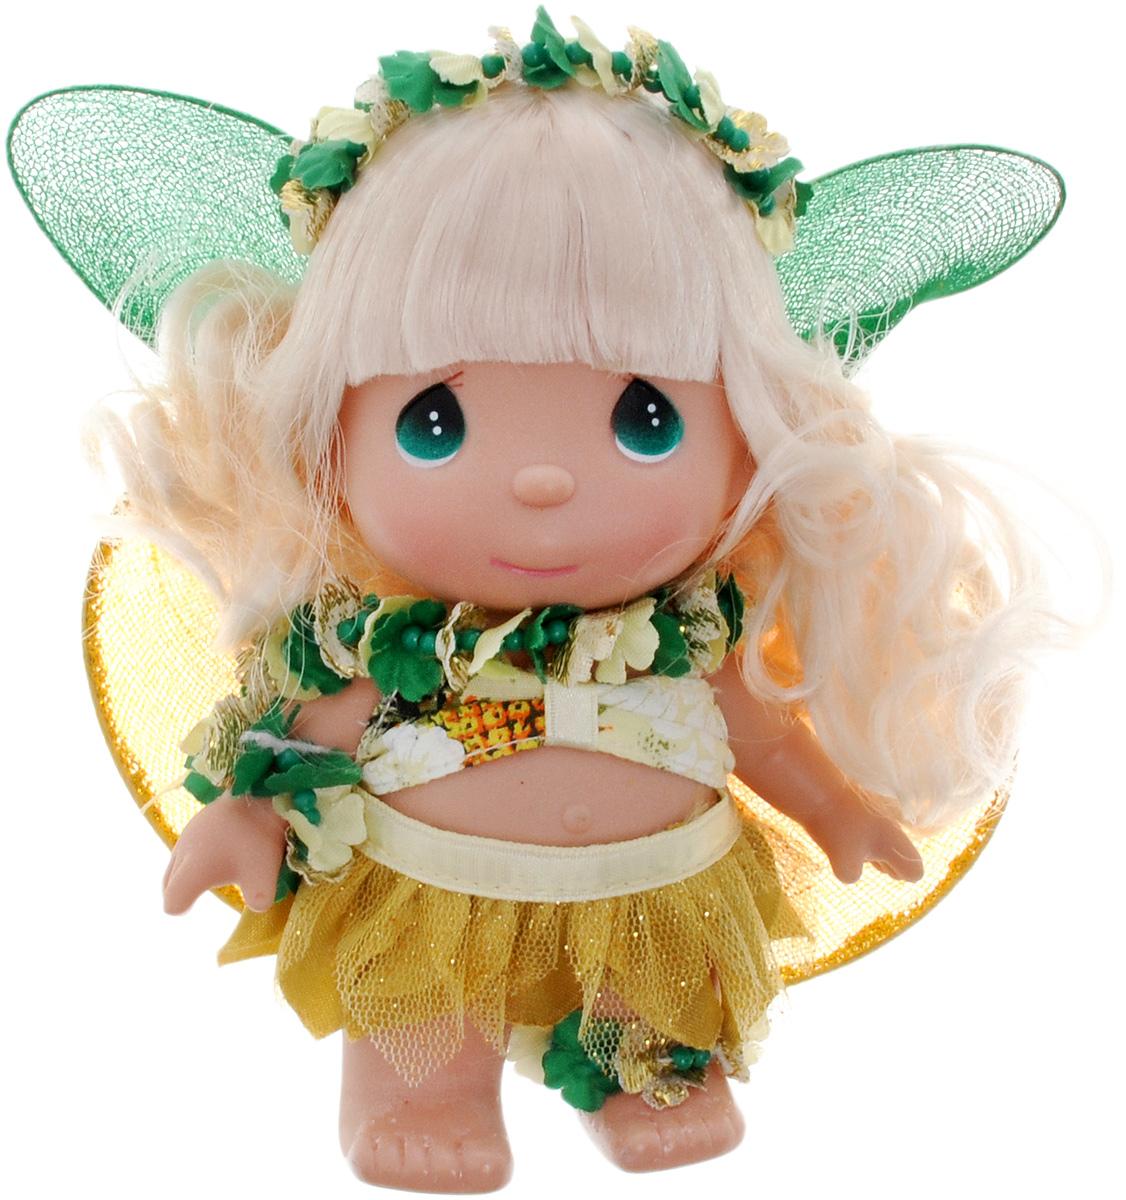 Precious Moments Мини-кукла Волшебный ананас precious moments мини кукла бабочка цвет наряда розовый сиреневый